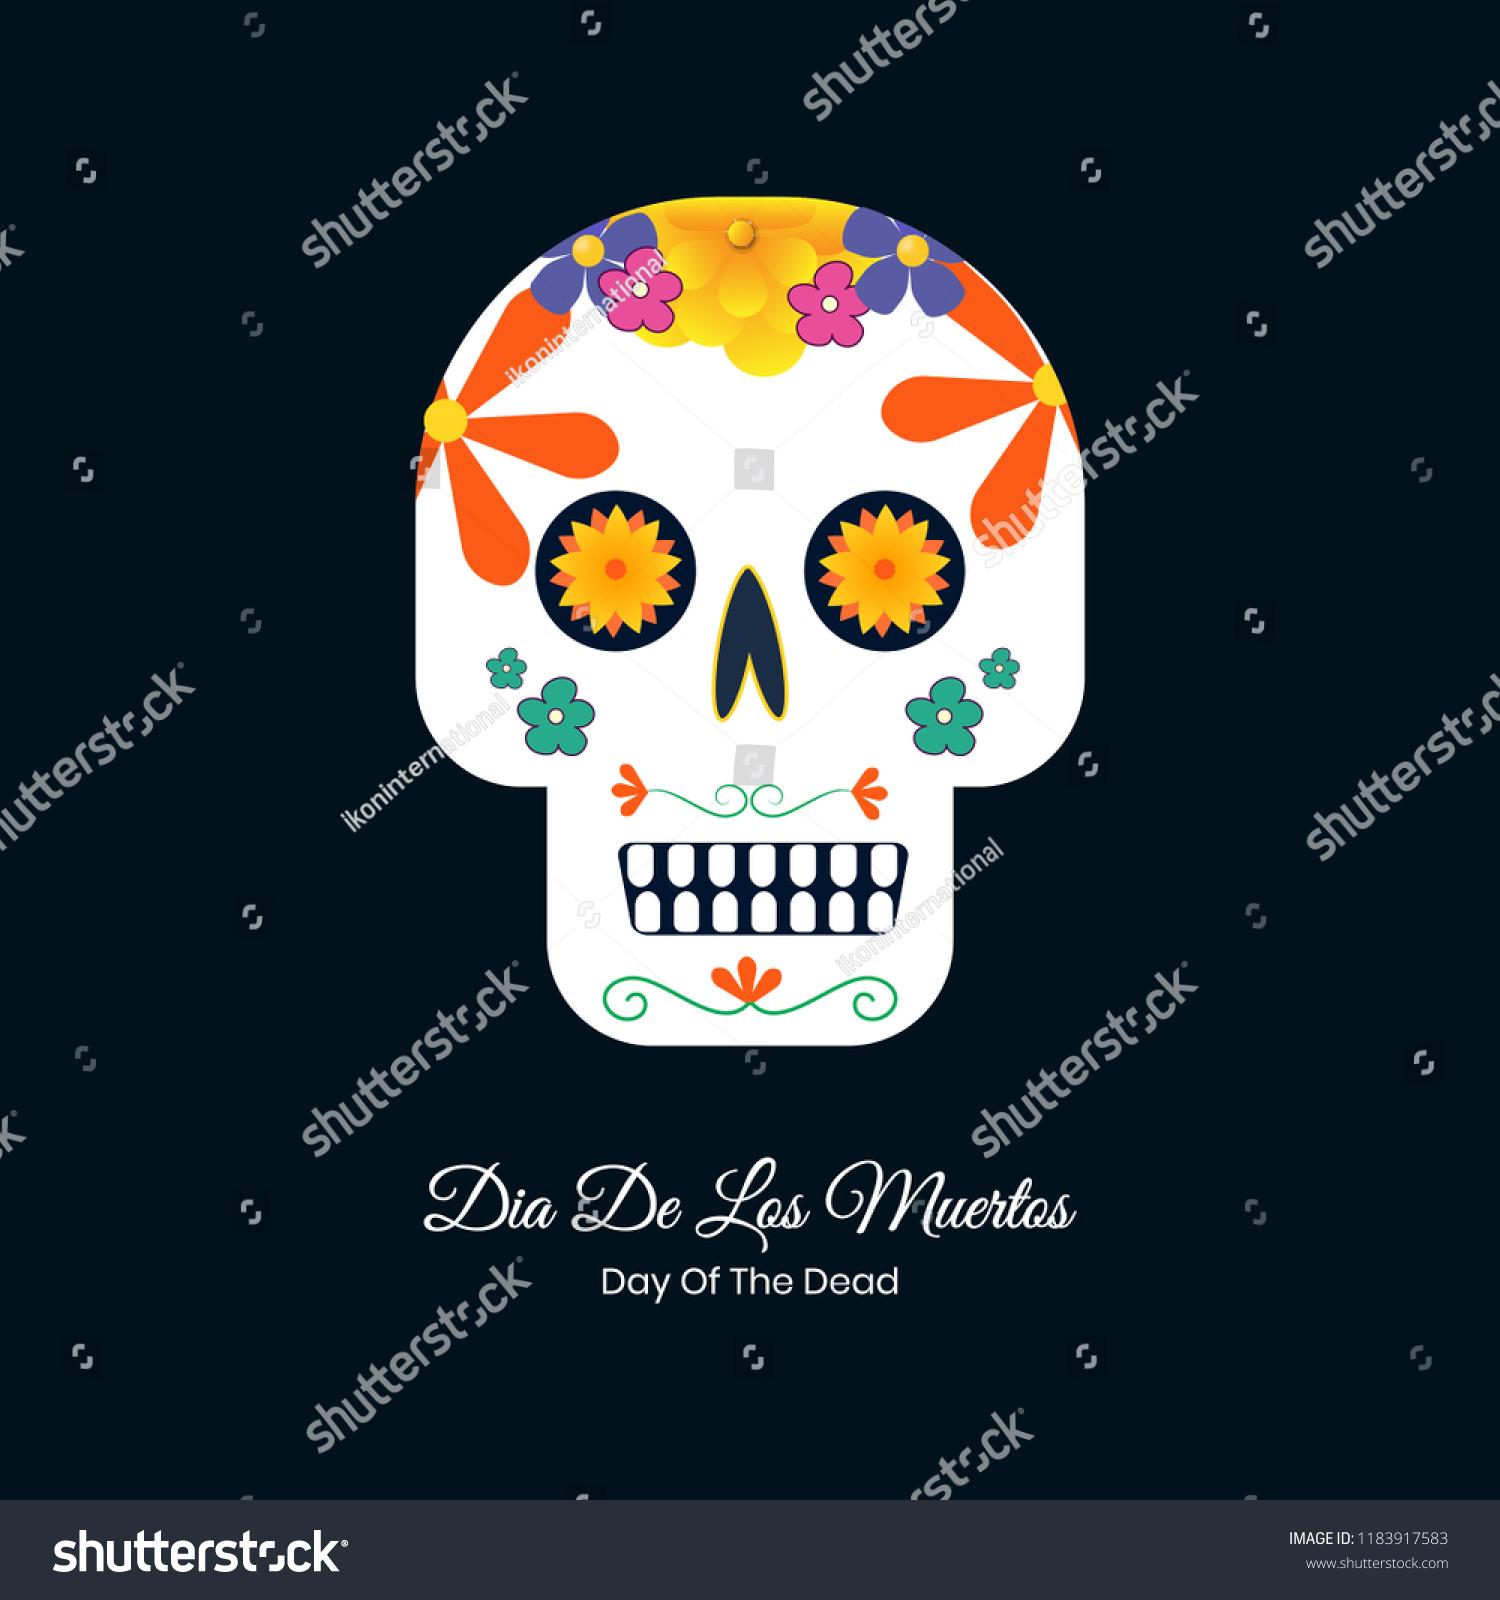 Dia de los muertos colorful vector skull design for wallpaper and banner design.